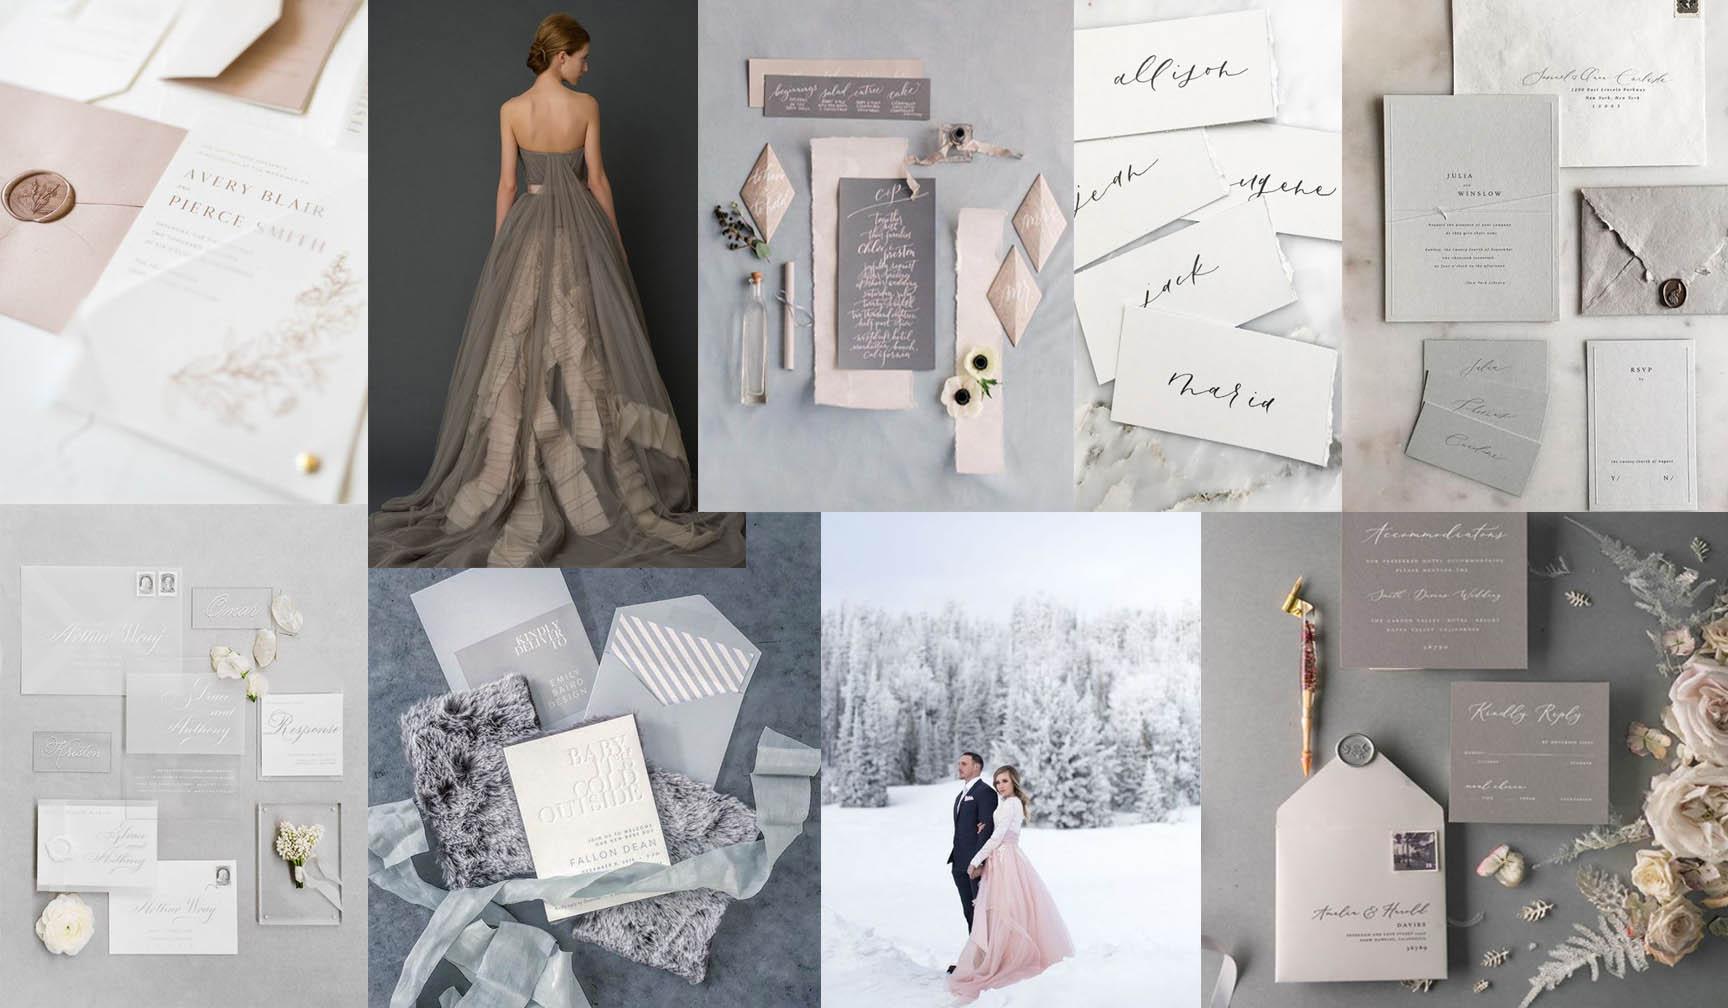 Lady Sansa Winterfell Stark wedding invites